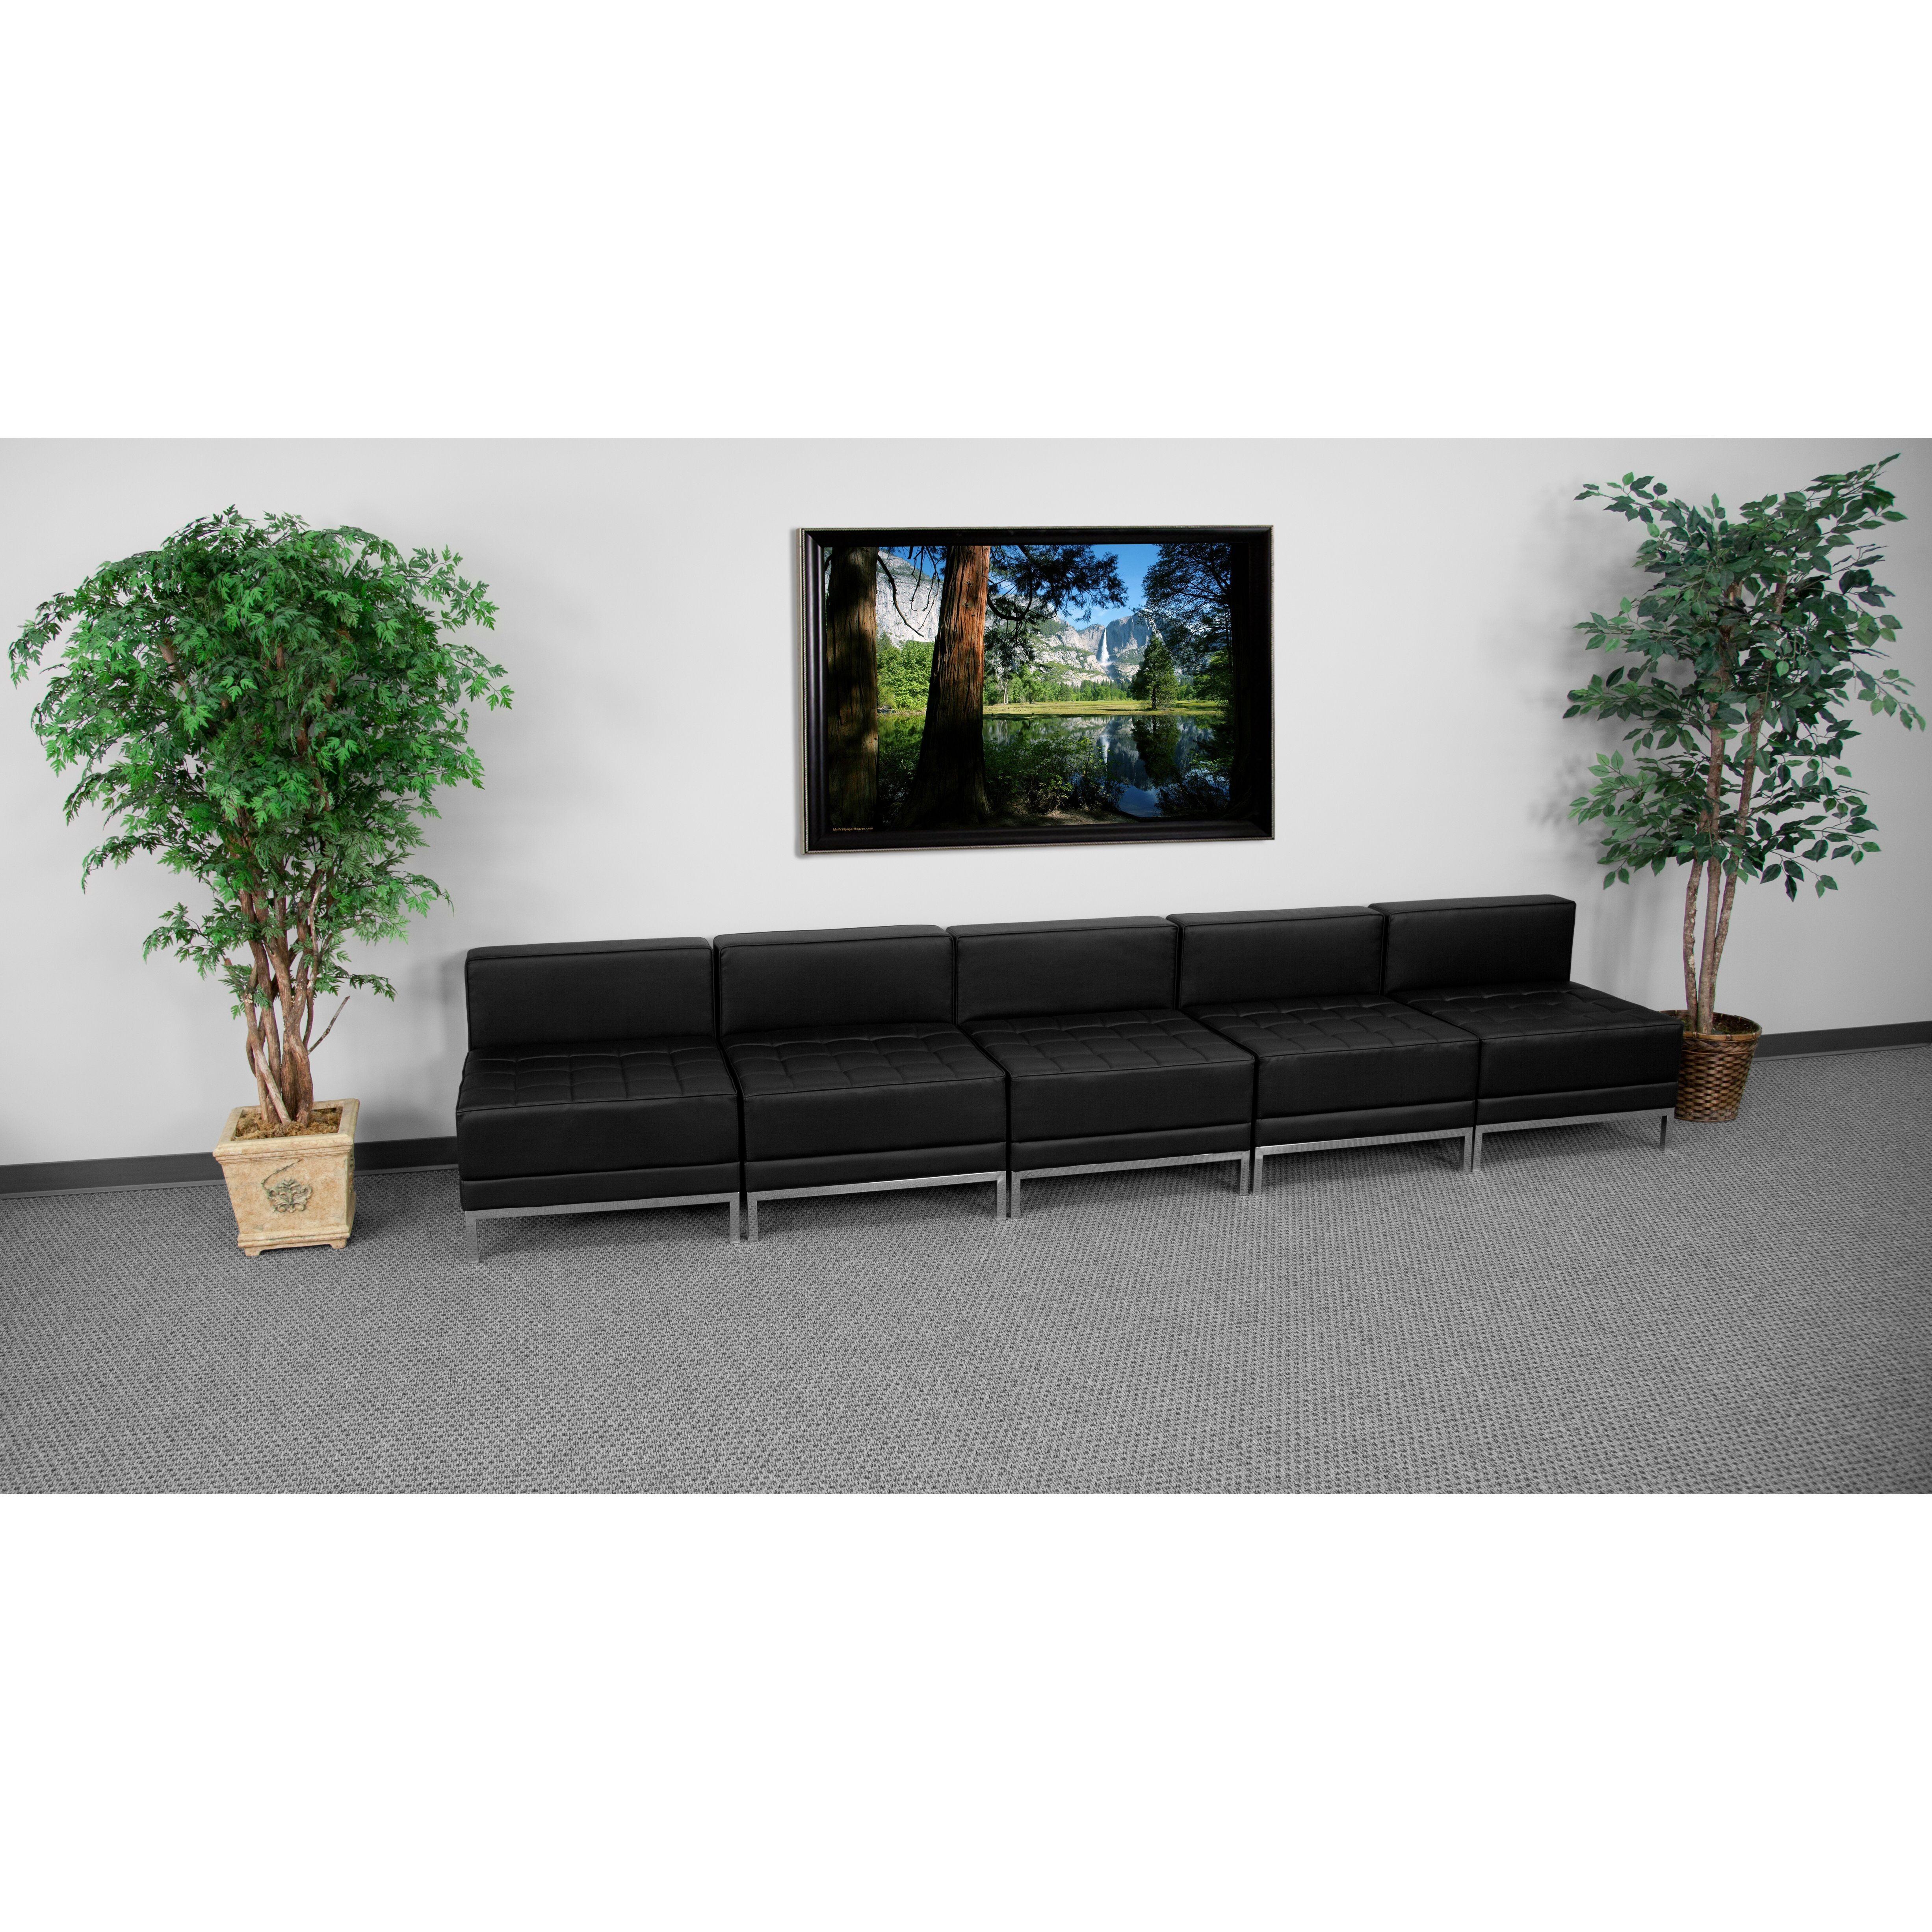 Flash Furniture ZB-IMAG-MIDCH-5-GG HERCULES Imagination Series Lounge Set, 5 Seats